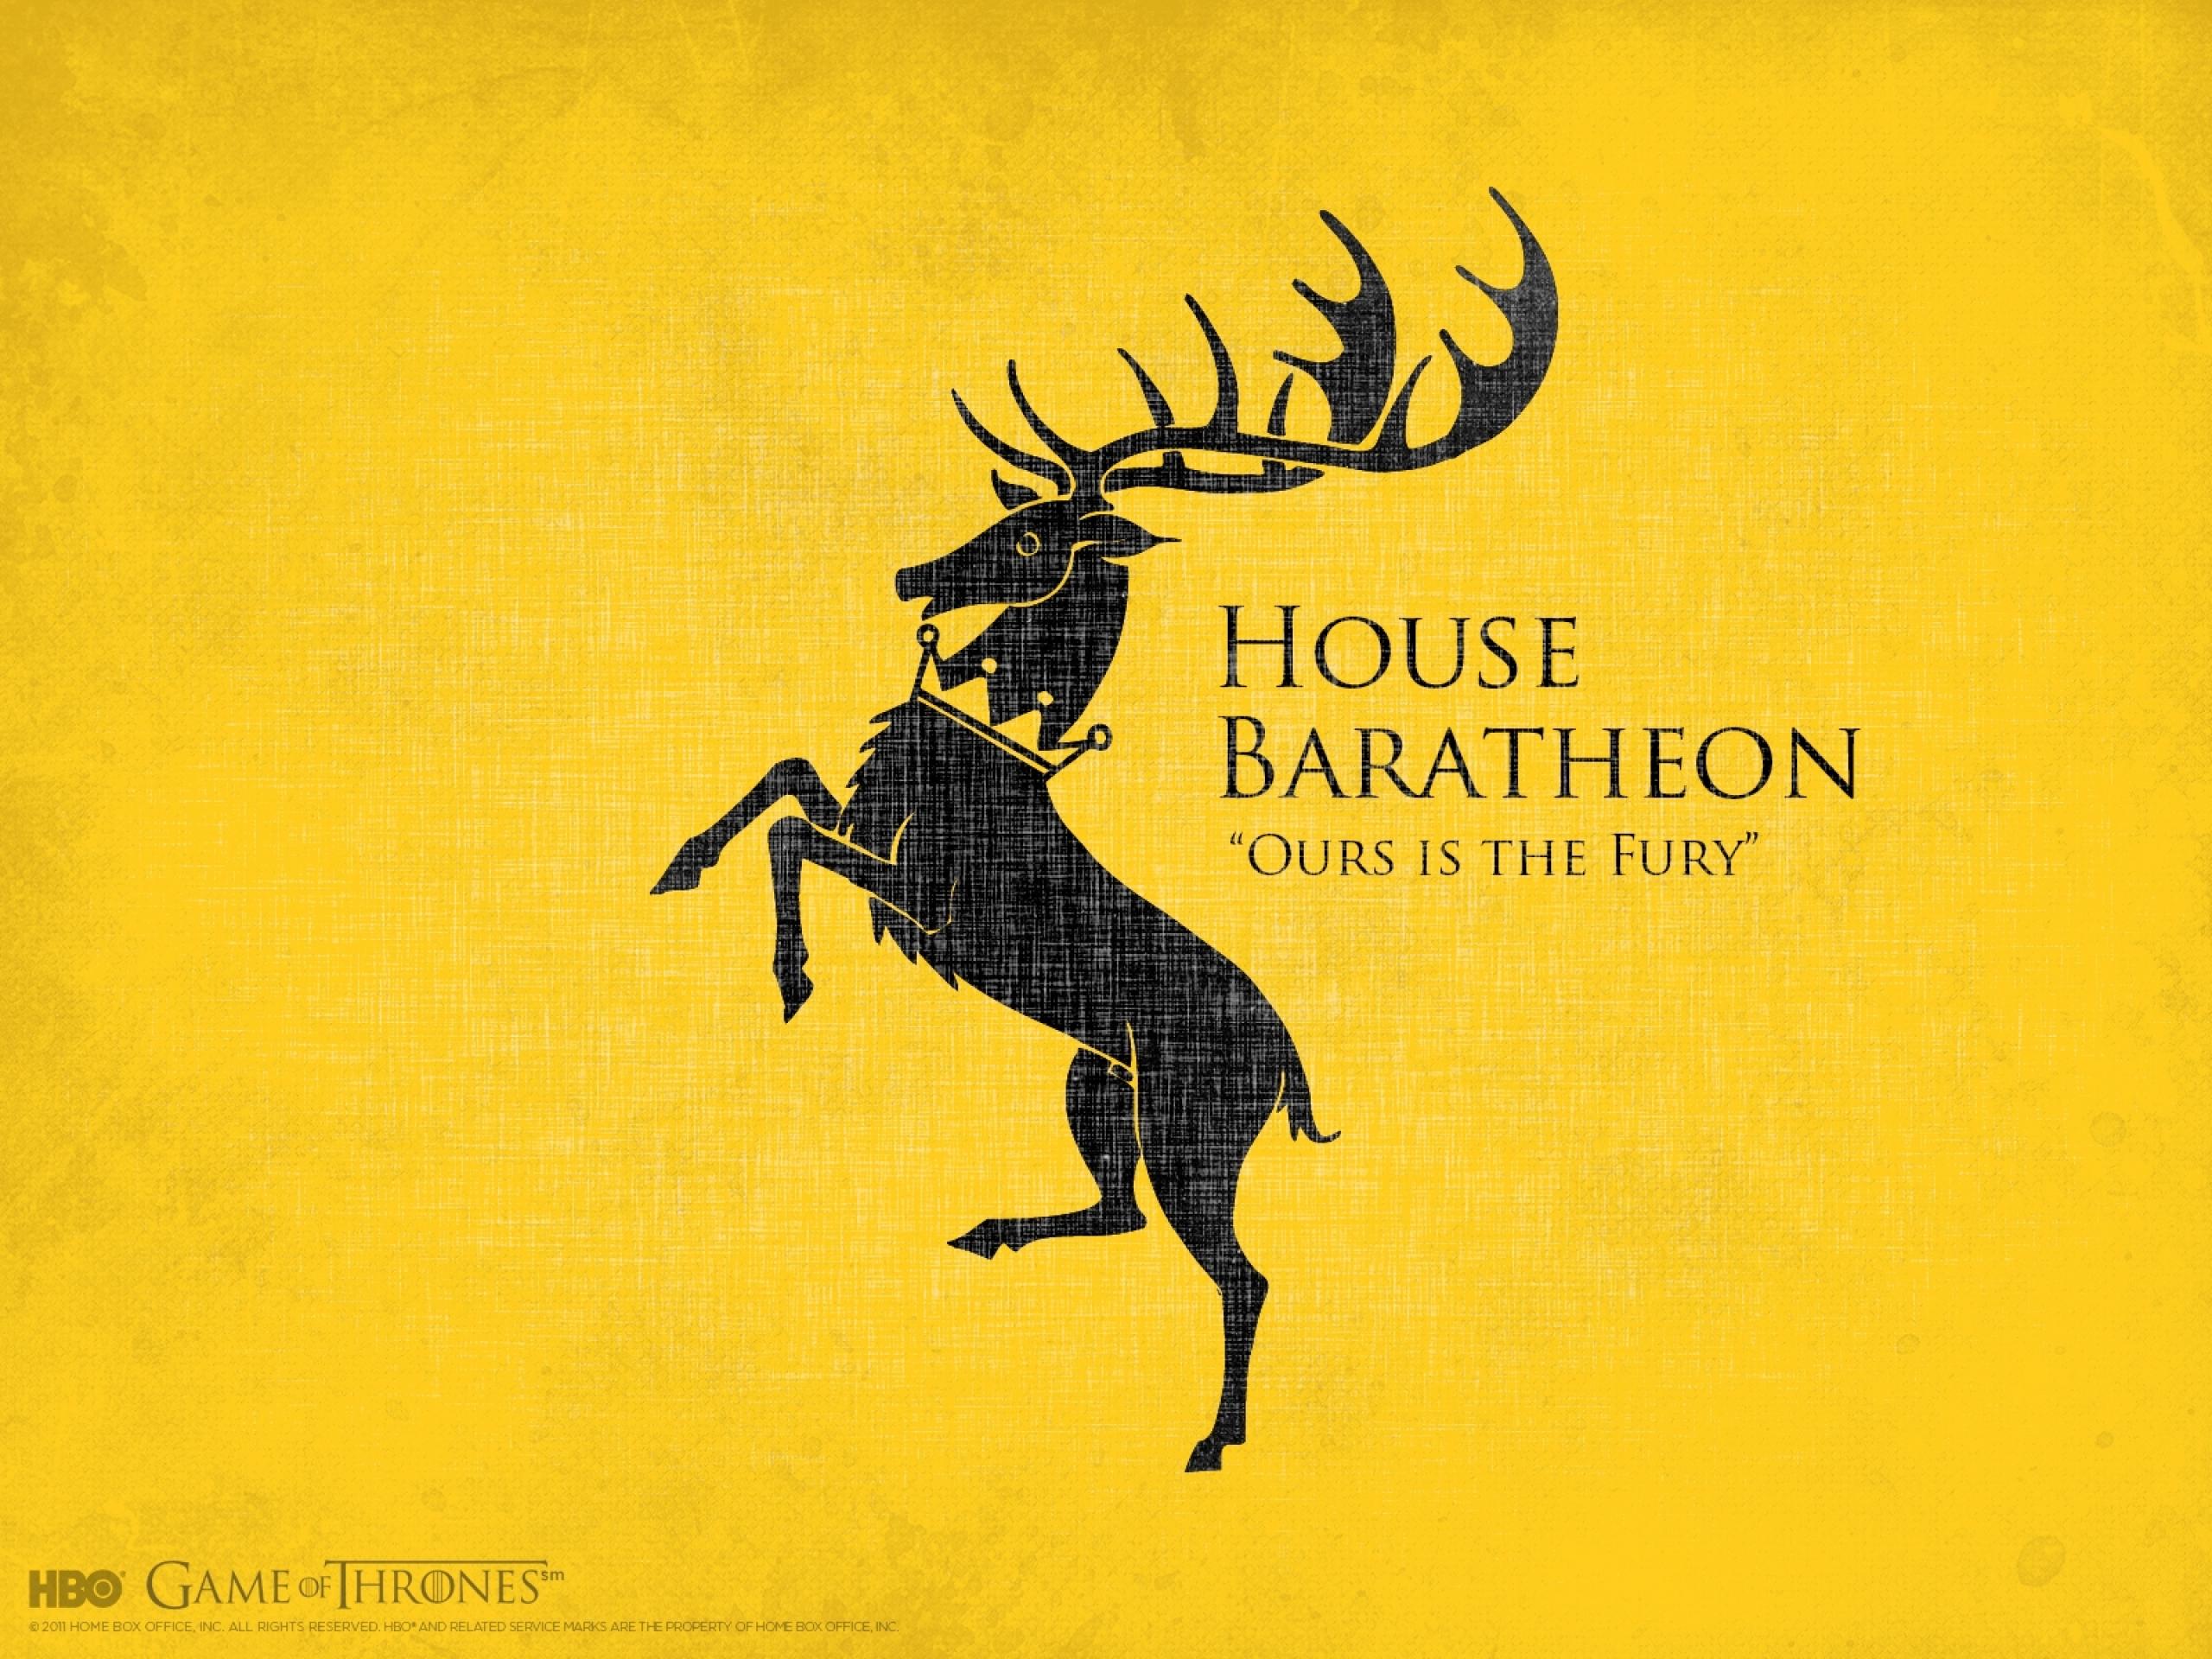 series arms house baratheon 1600x1200 wallpaper Wallpaper 2560x1920